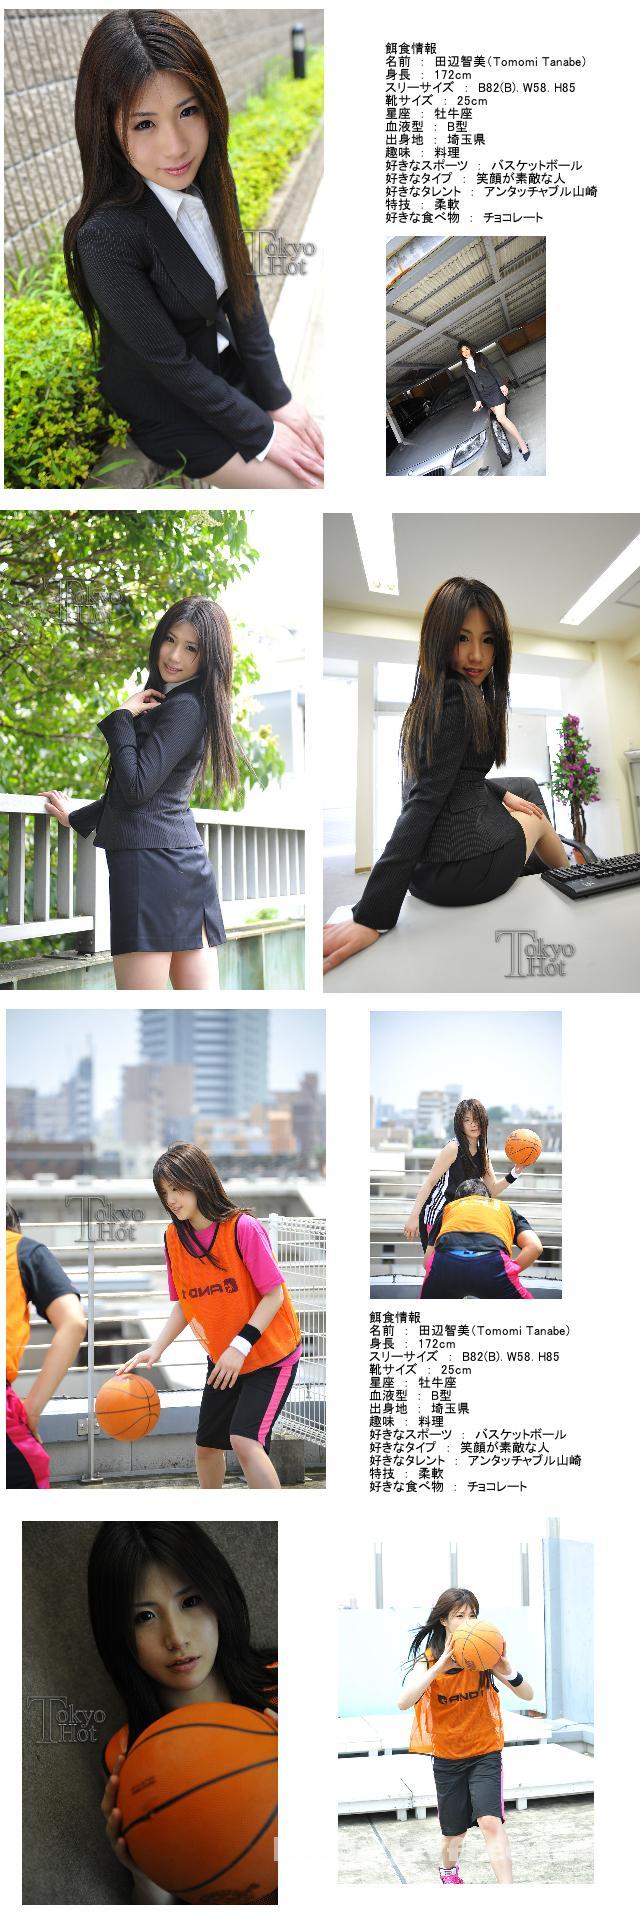 Tokyo Hot n0565 美人アスリート2穴蹂躙汁 田辺智美 田辺智美 Tomomi Tanabe Tokyo Hot